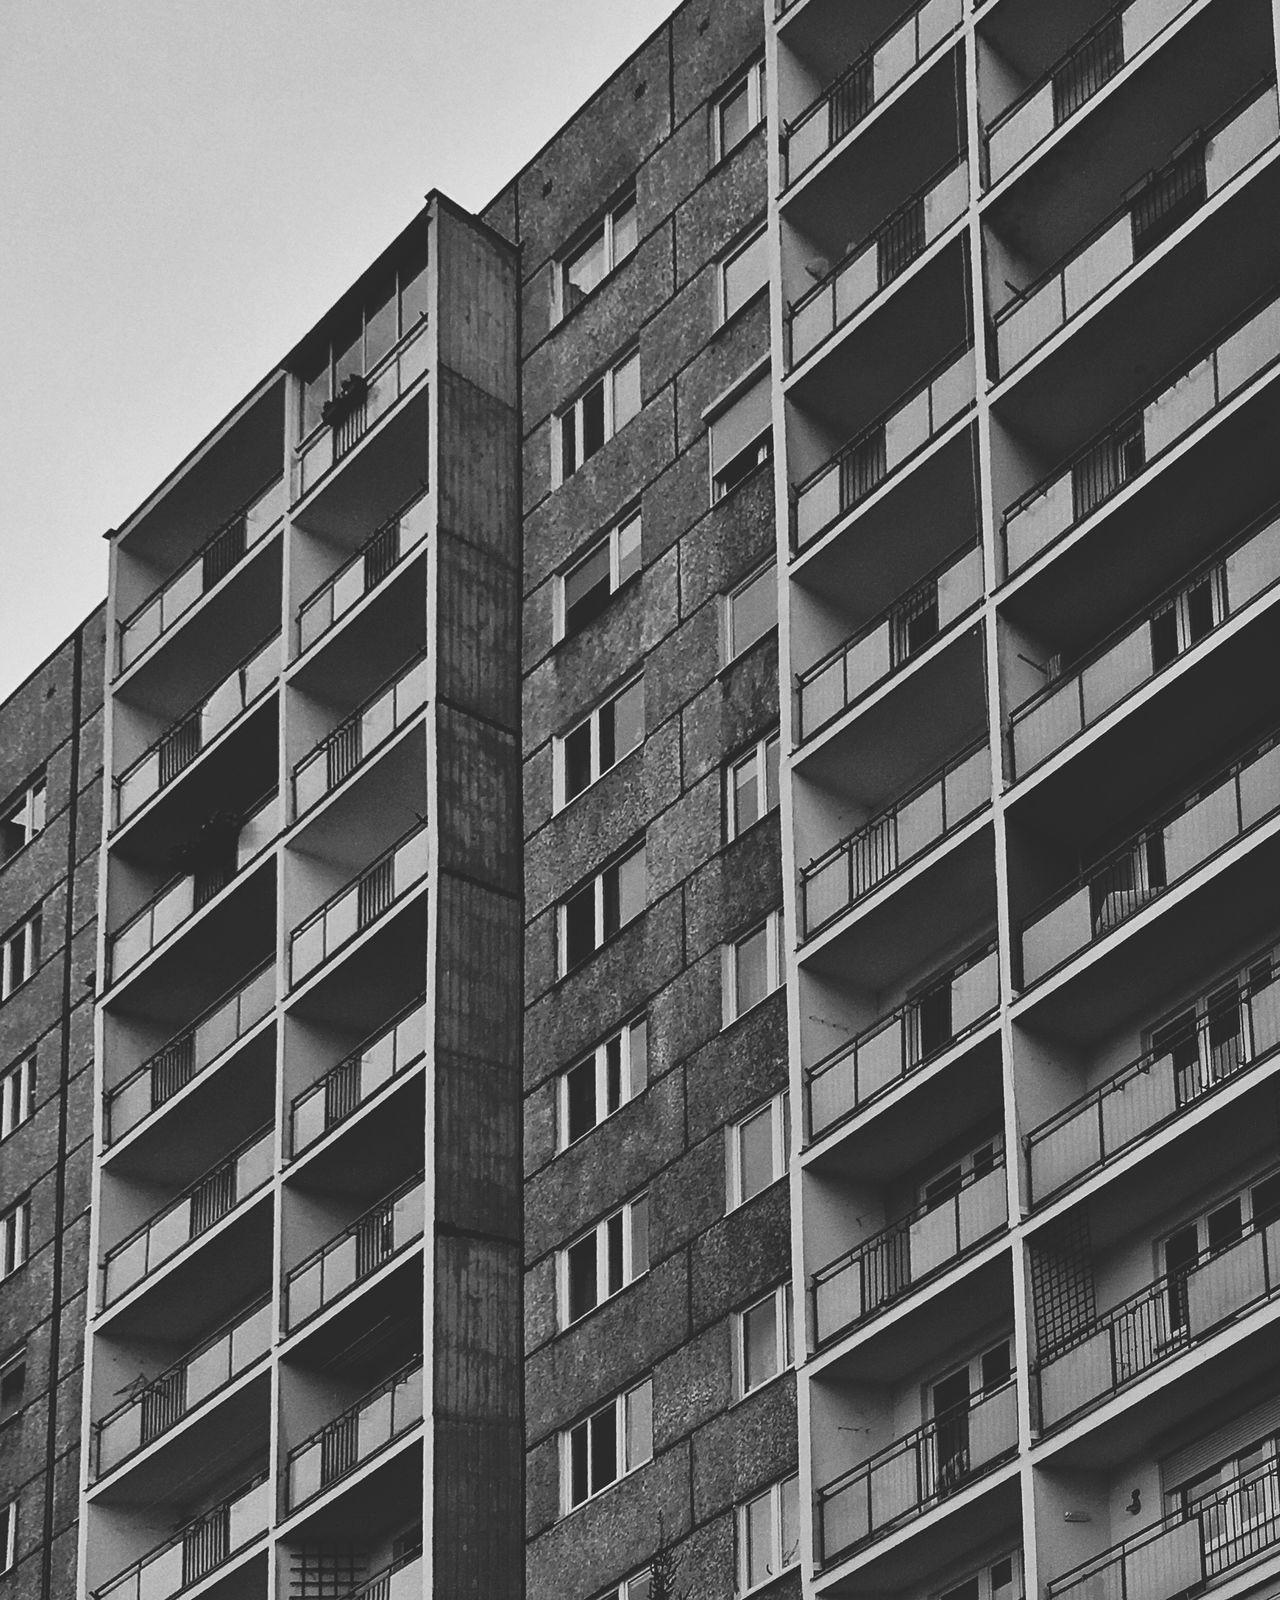 Beautiful stock photos of schwarz weiß, Architecture, Building, Building Exterior, Built Structure